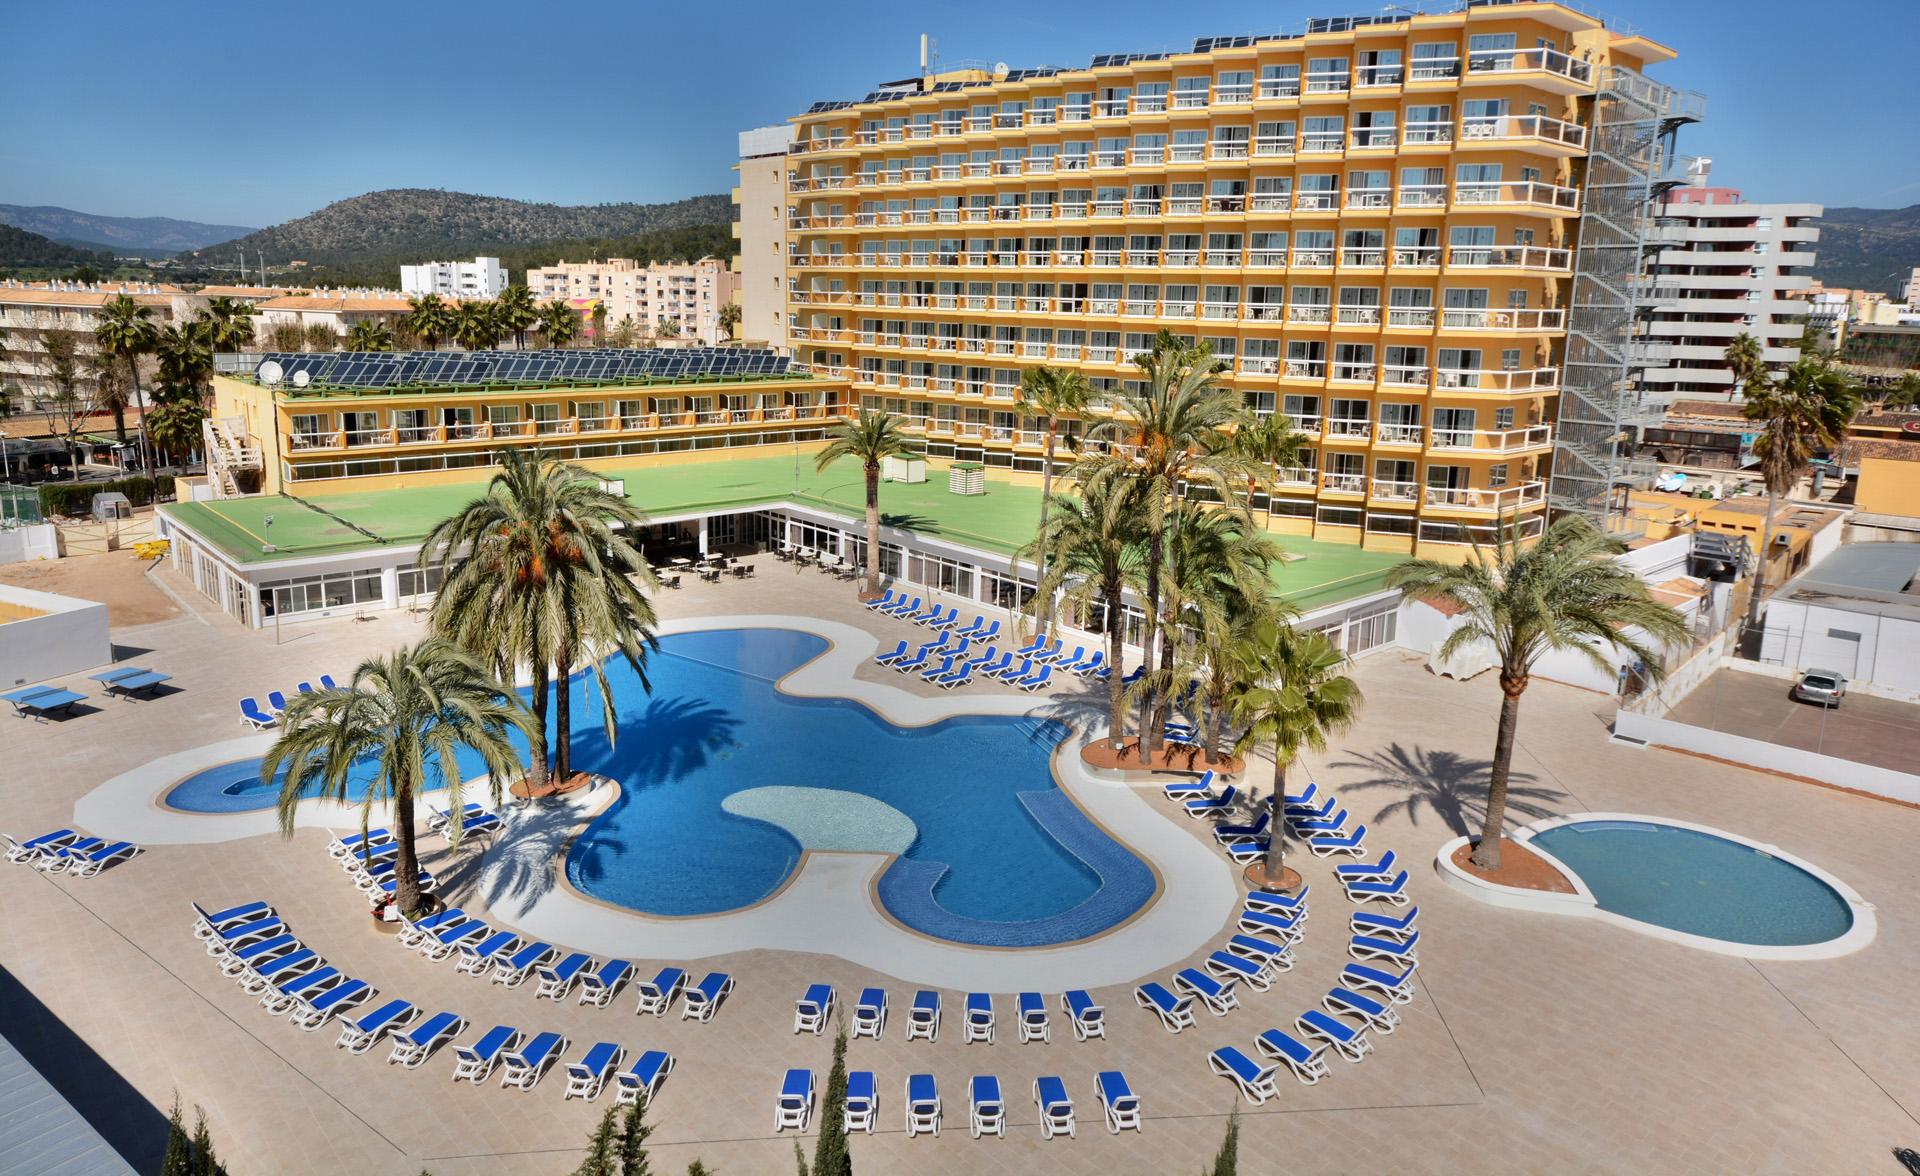 Hotel Samos Magaluf Mallorca